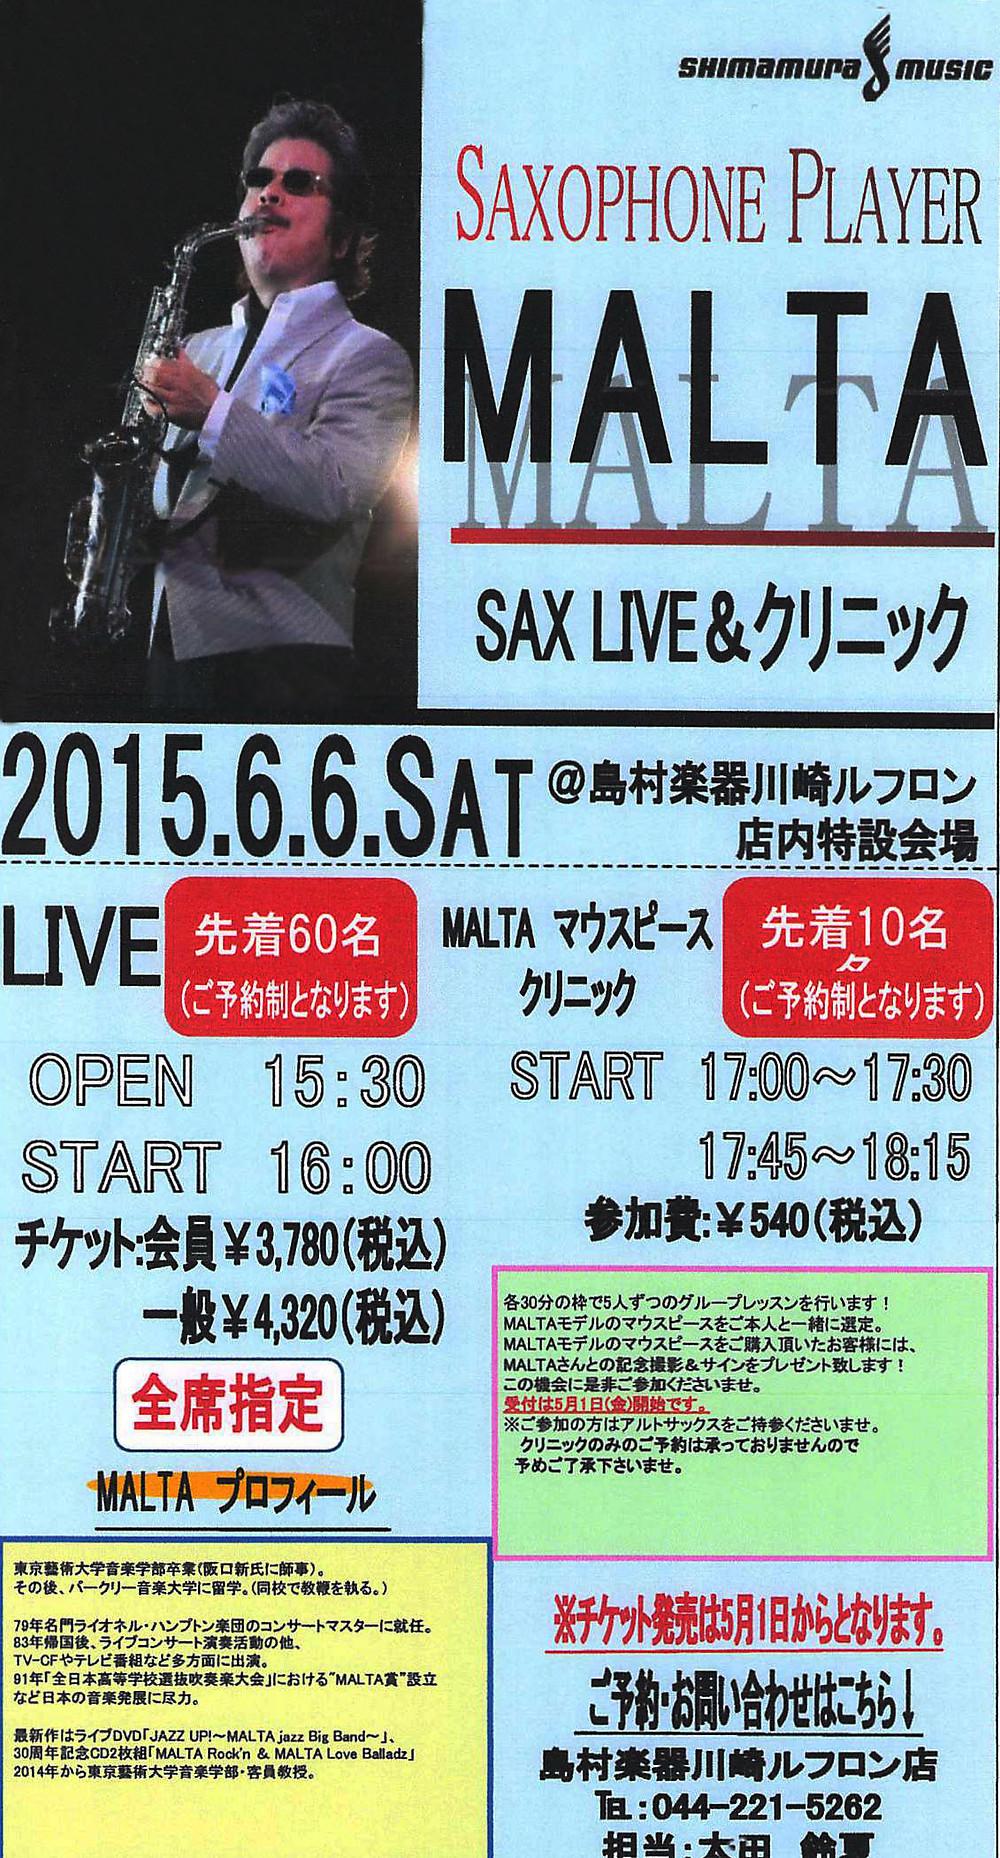 wenKawasakiSHIMAMURARAgakkiMALTAlive06062015.jpg